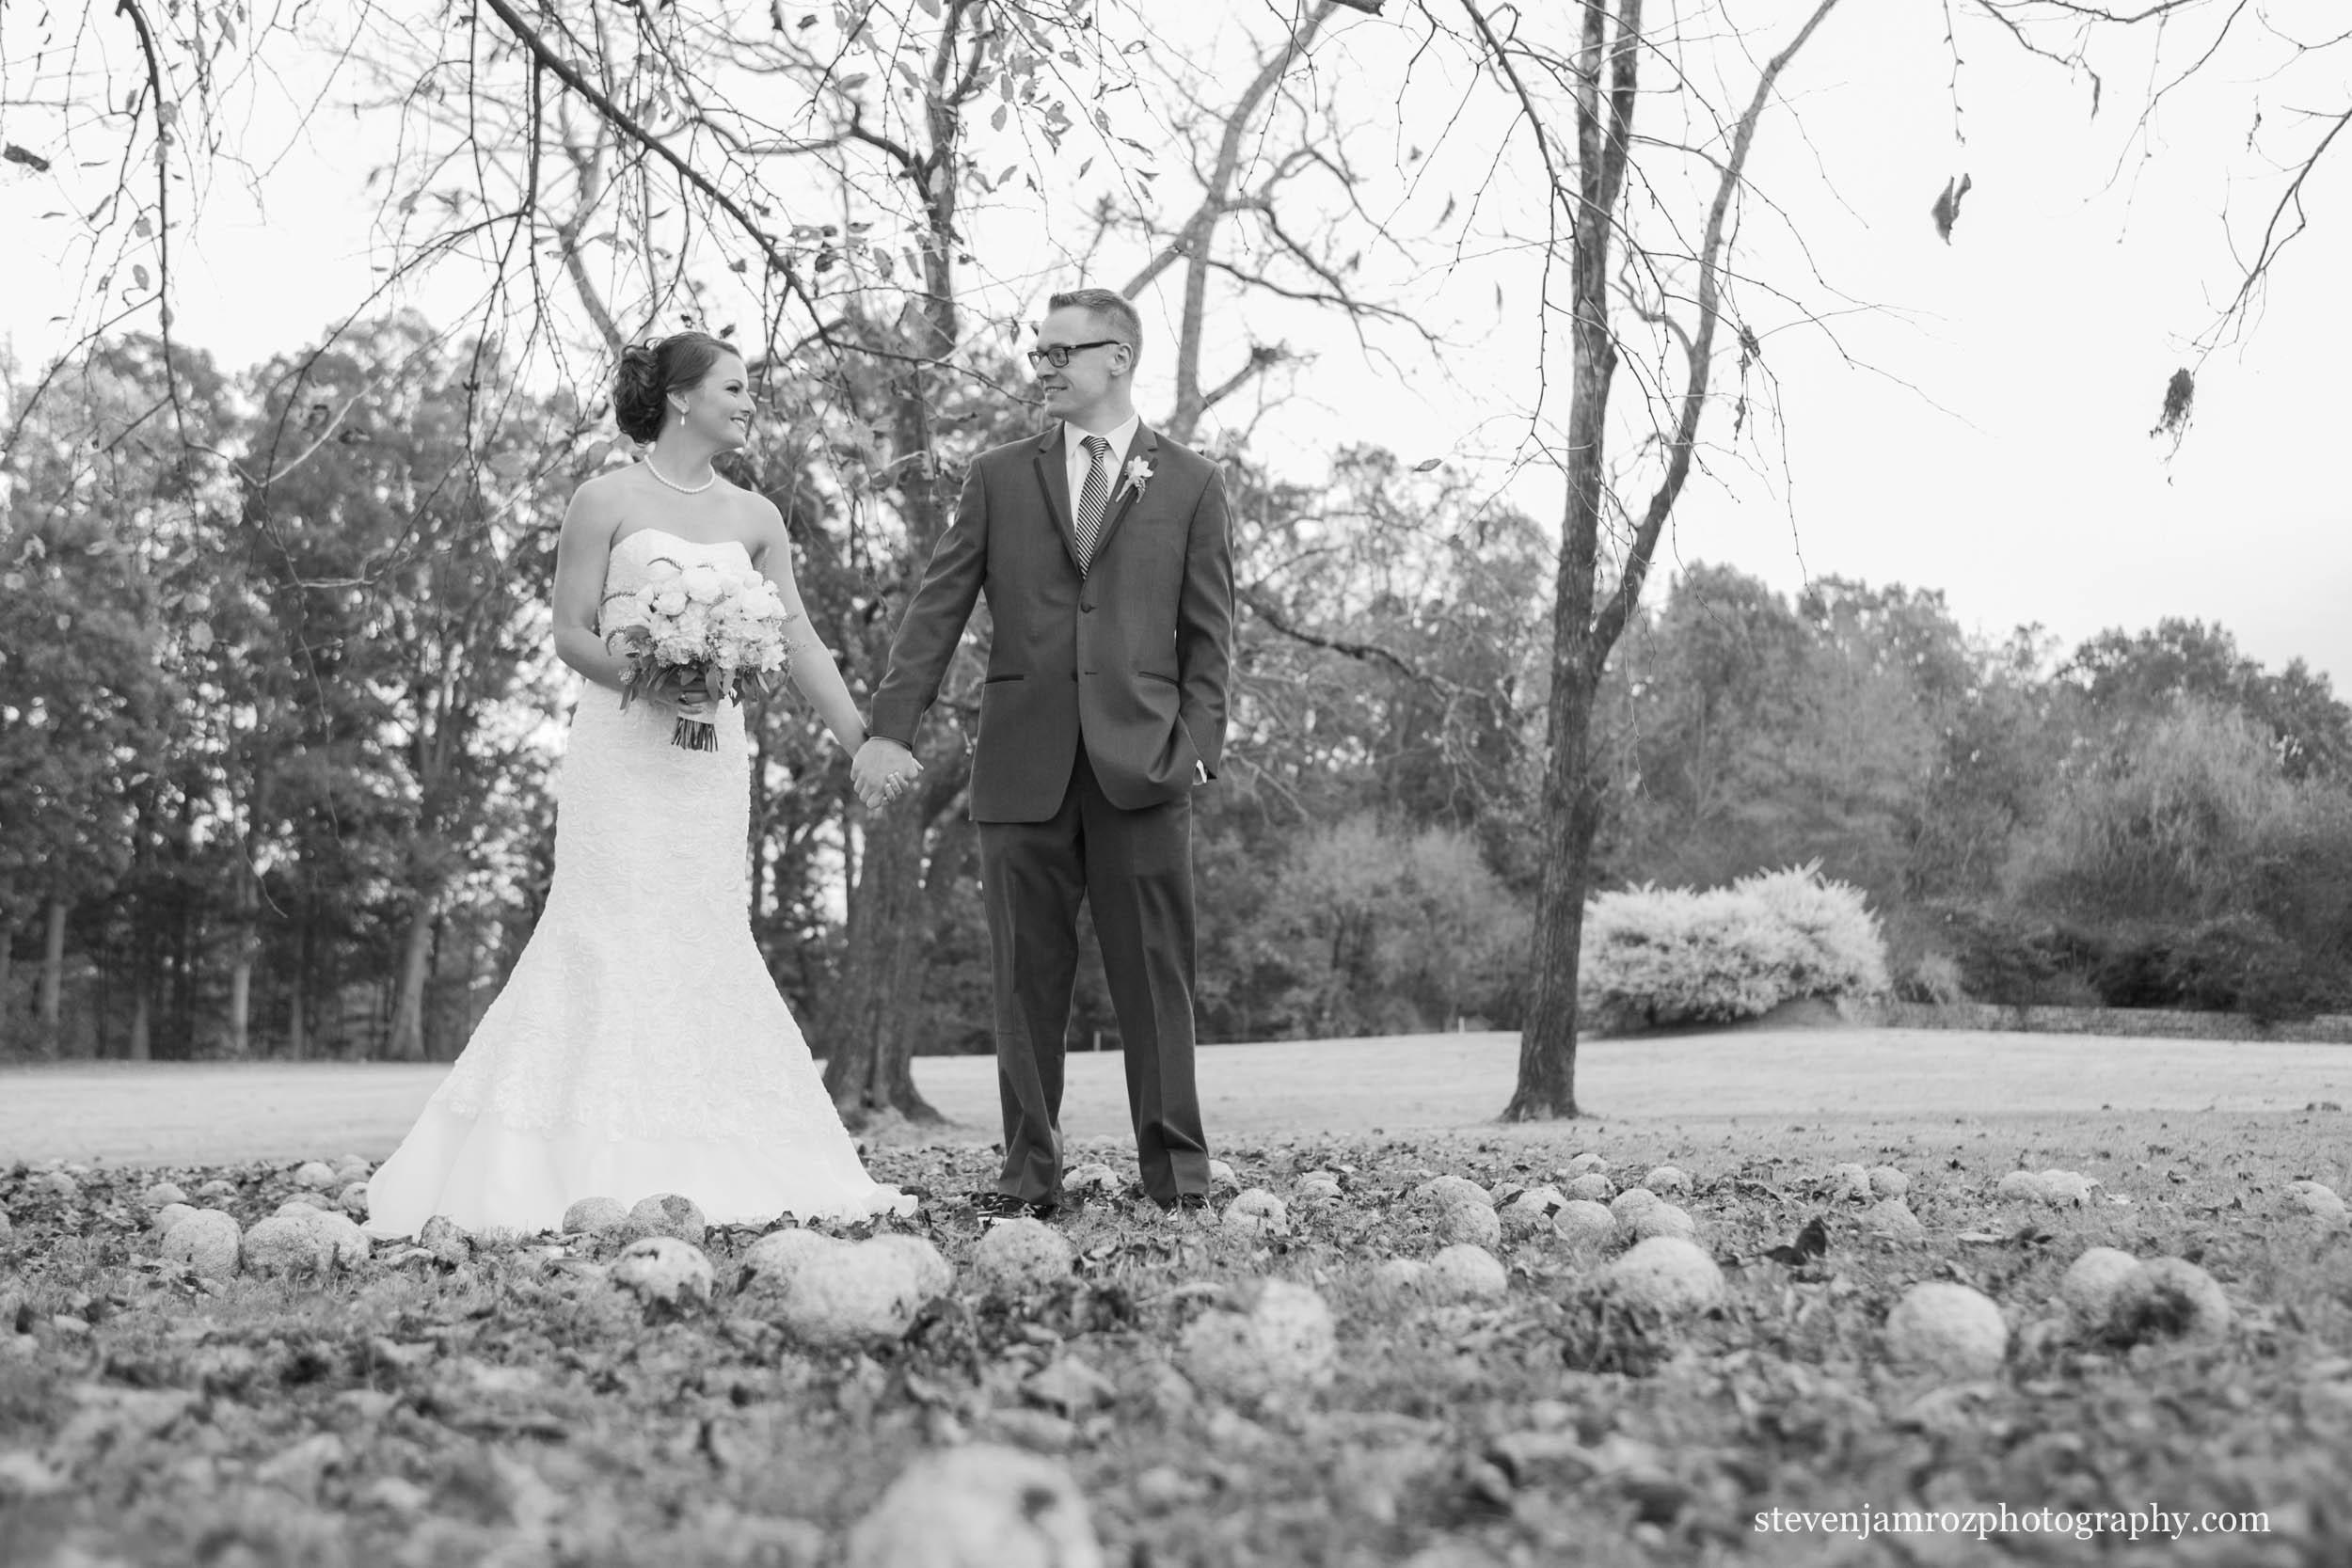 hudson-manor-estate-wedding-steven-jamroz-photography-0626.jpg